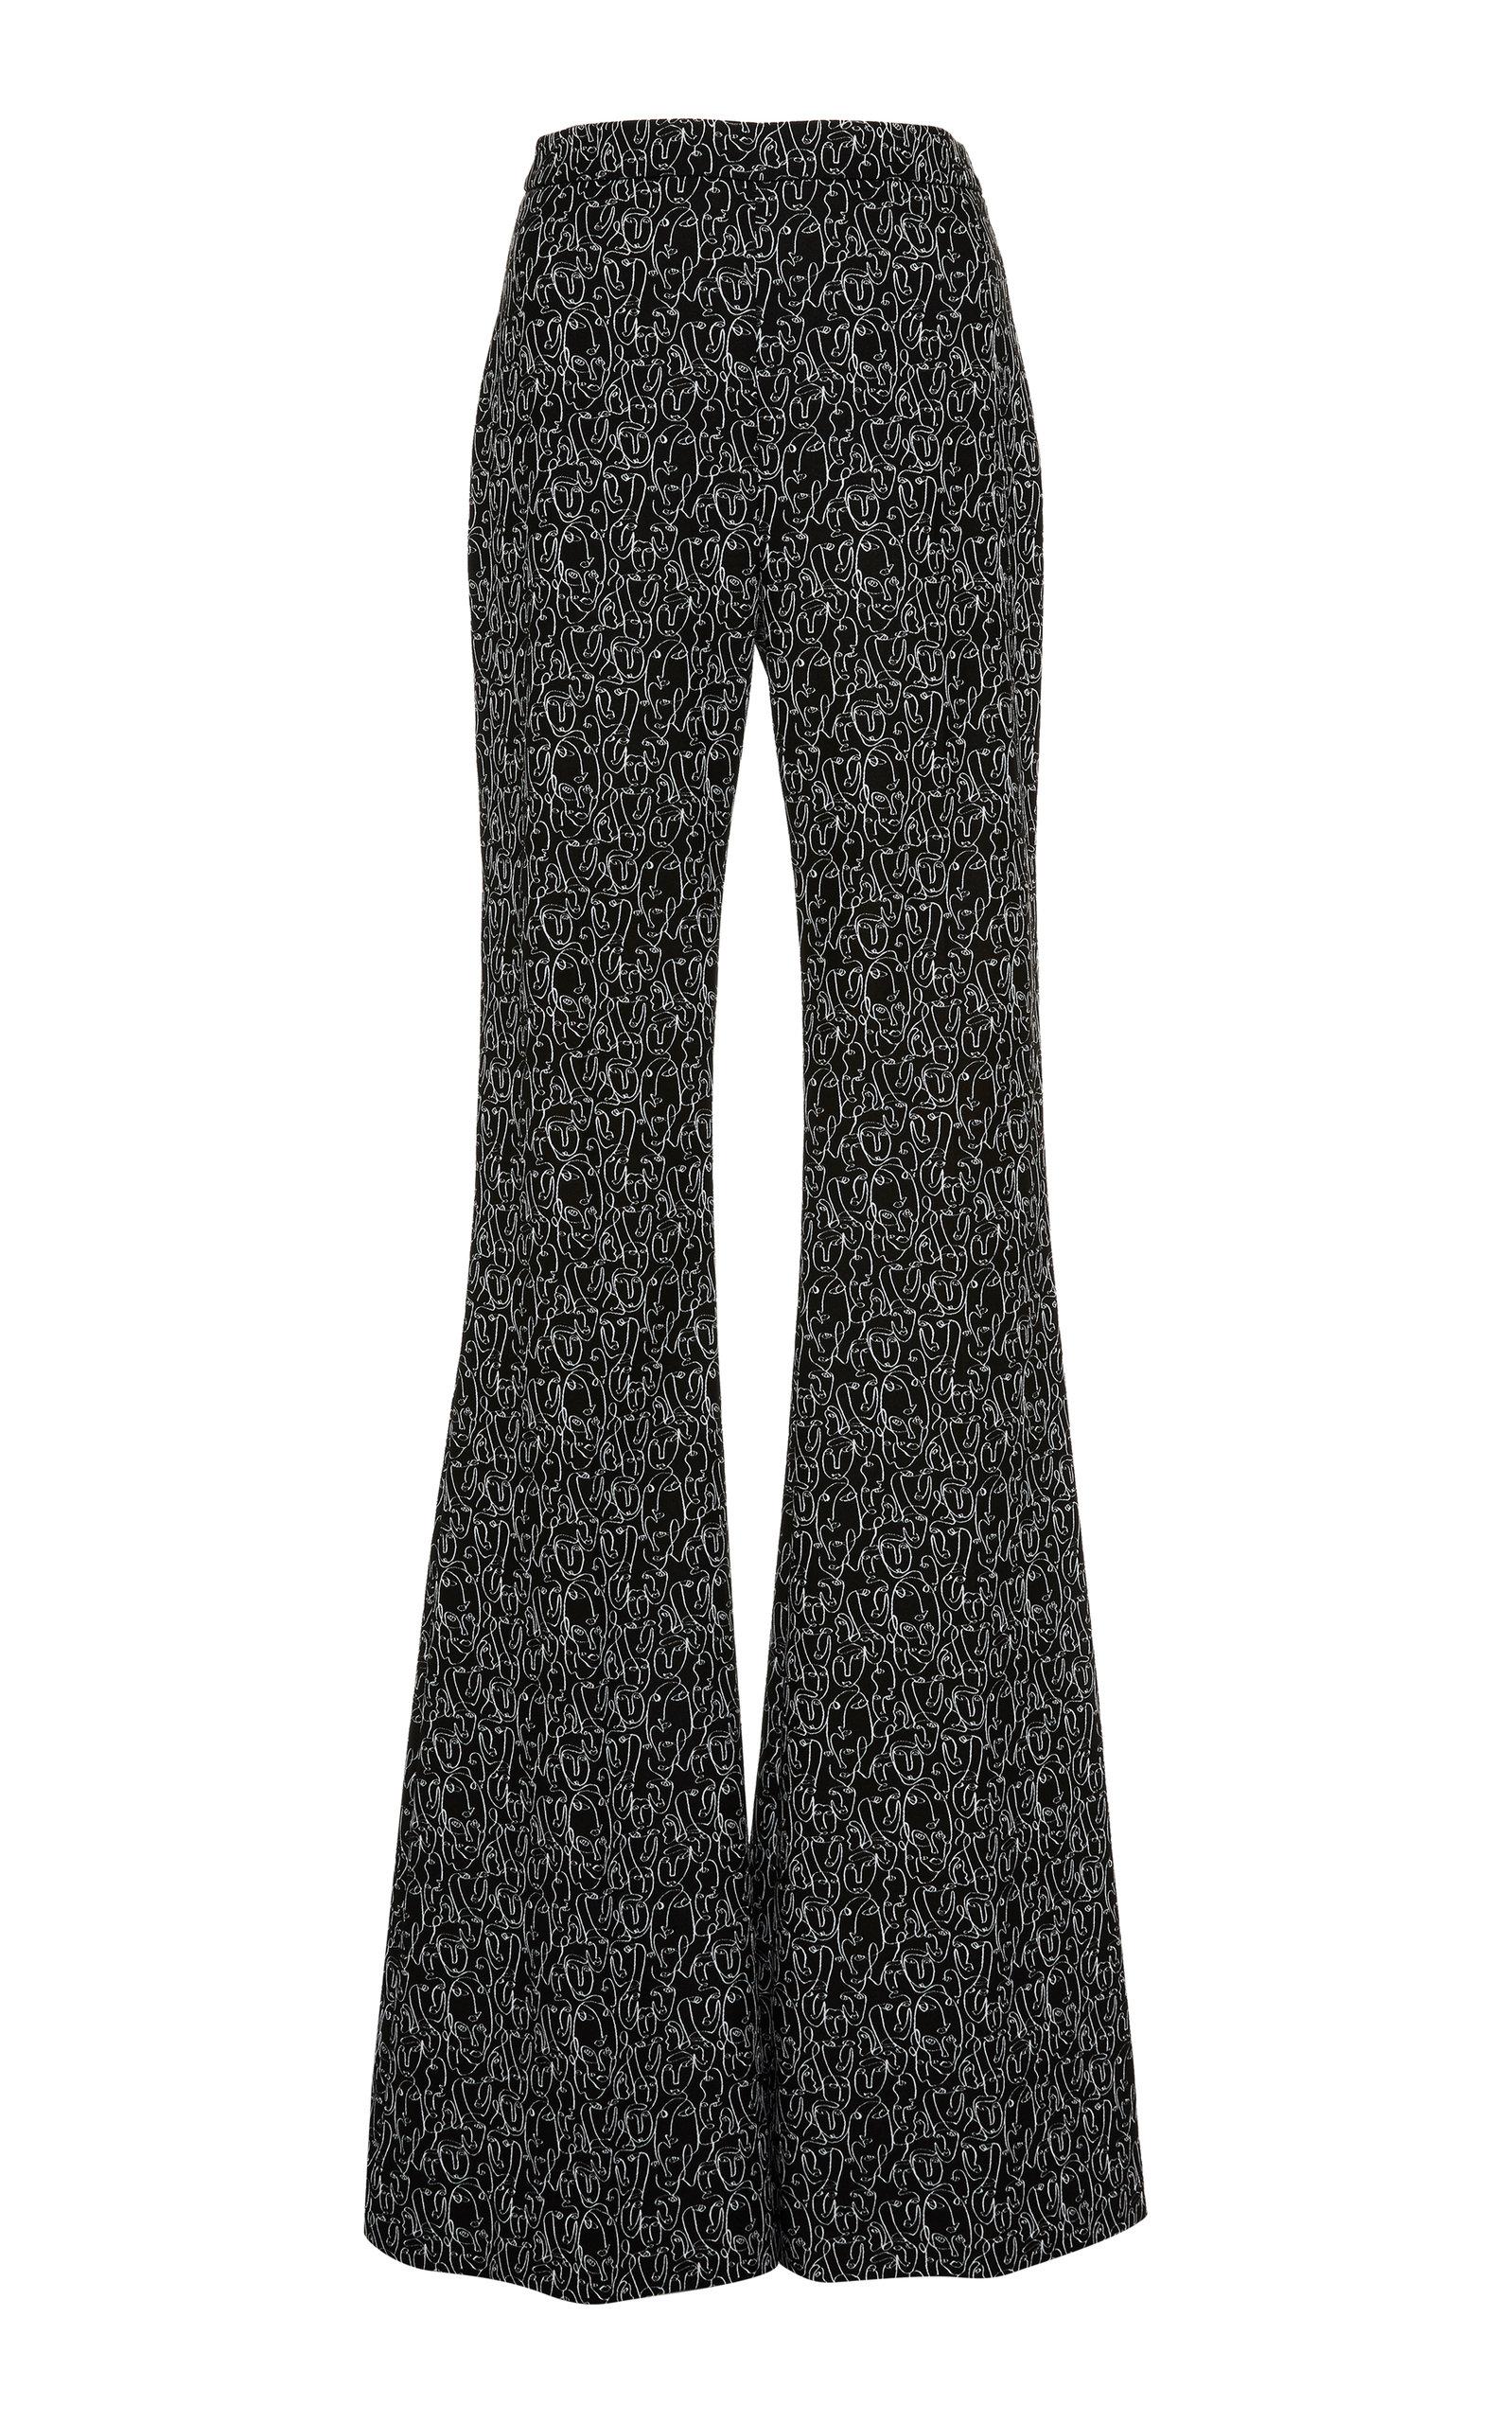 250210d0f3 Face-Print Flared Trousers by Christian Siriano   Moda Operandi